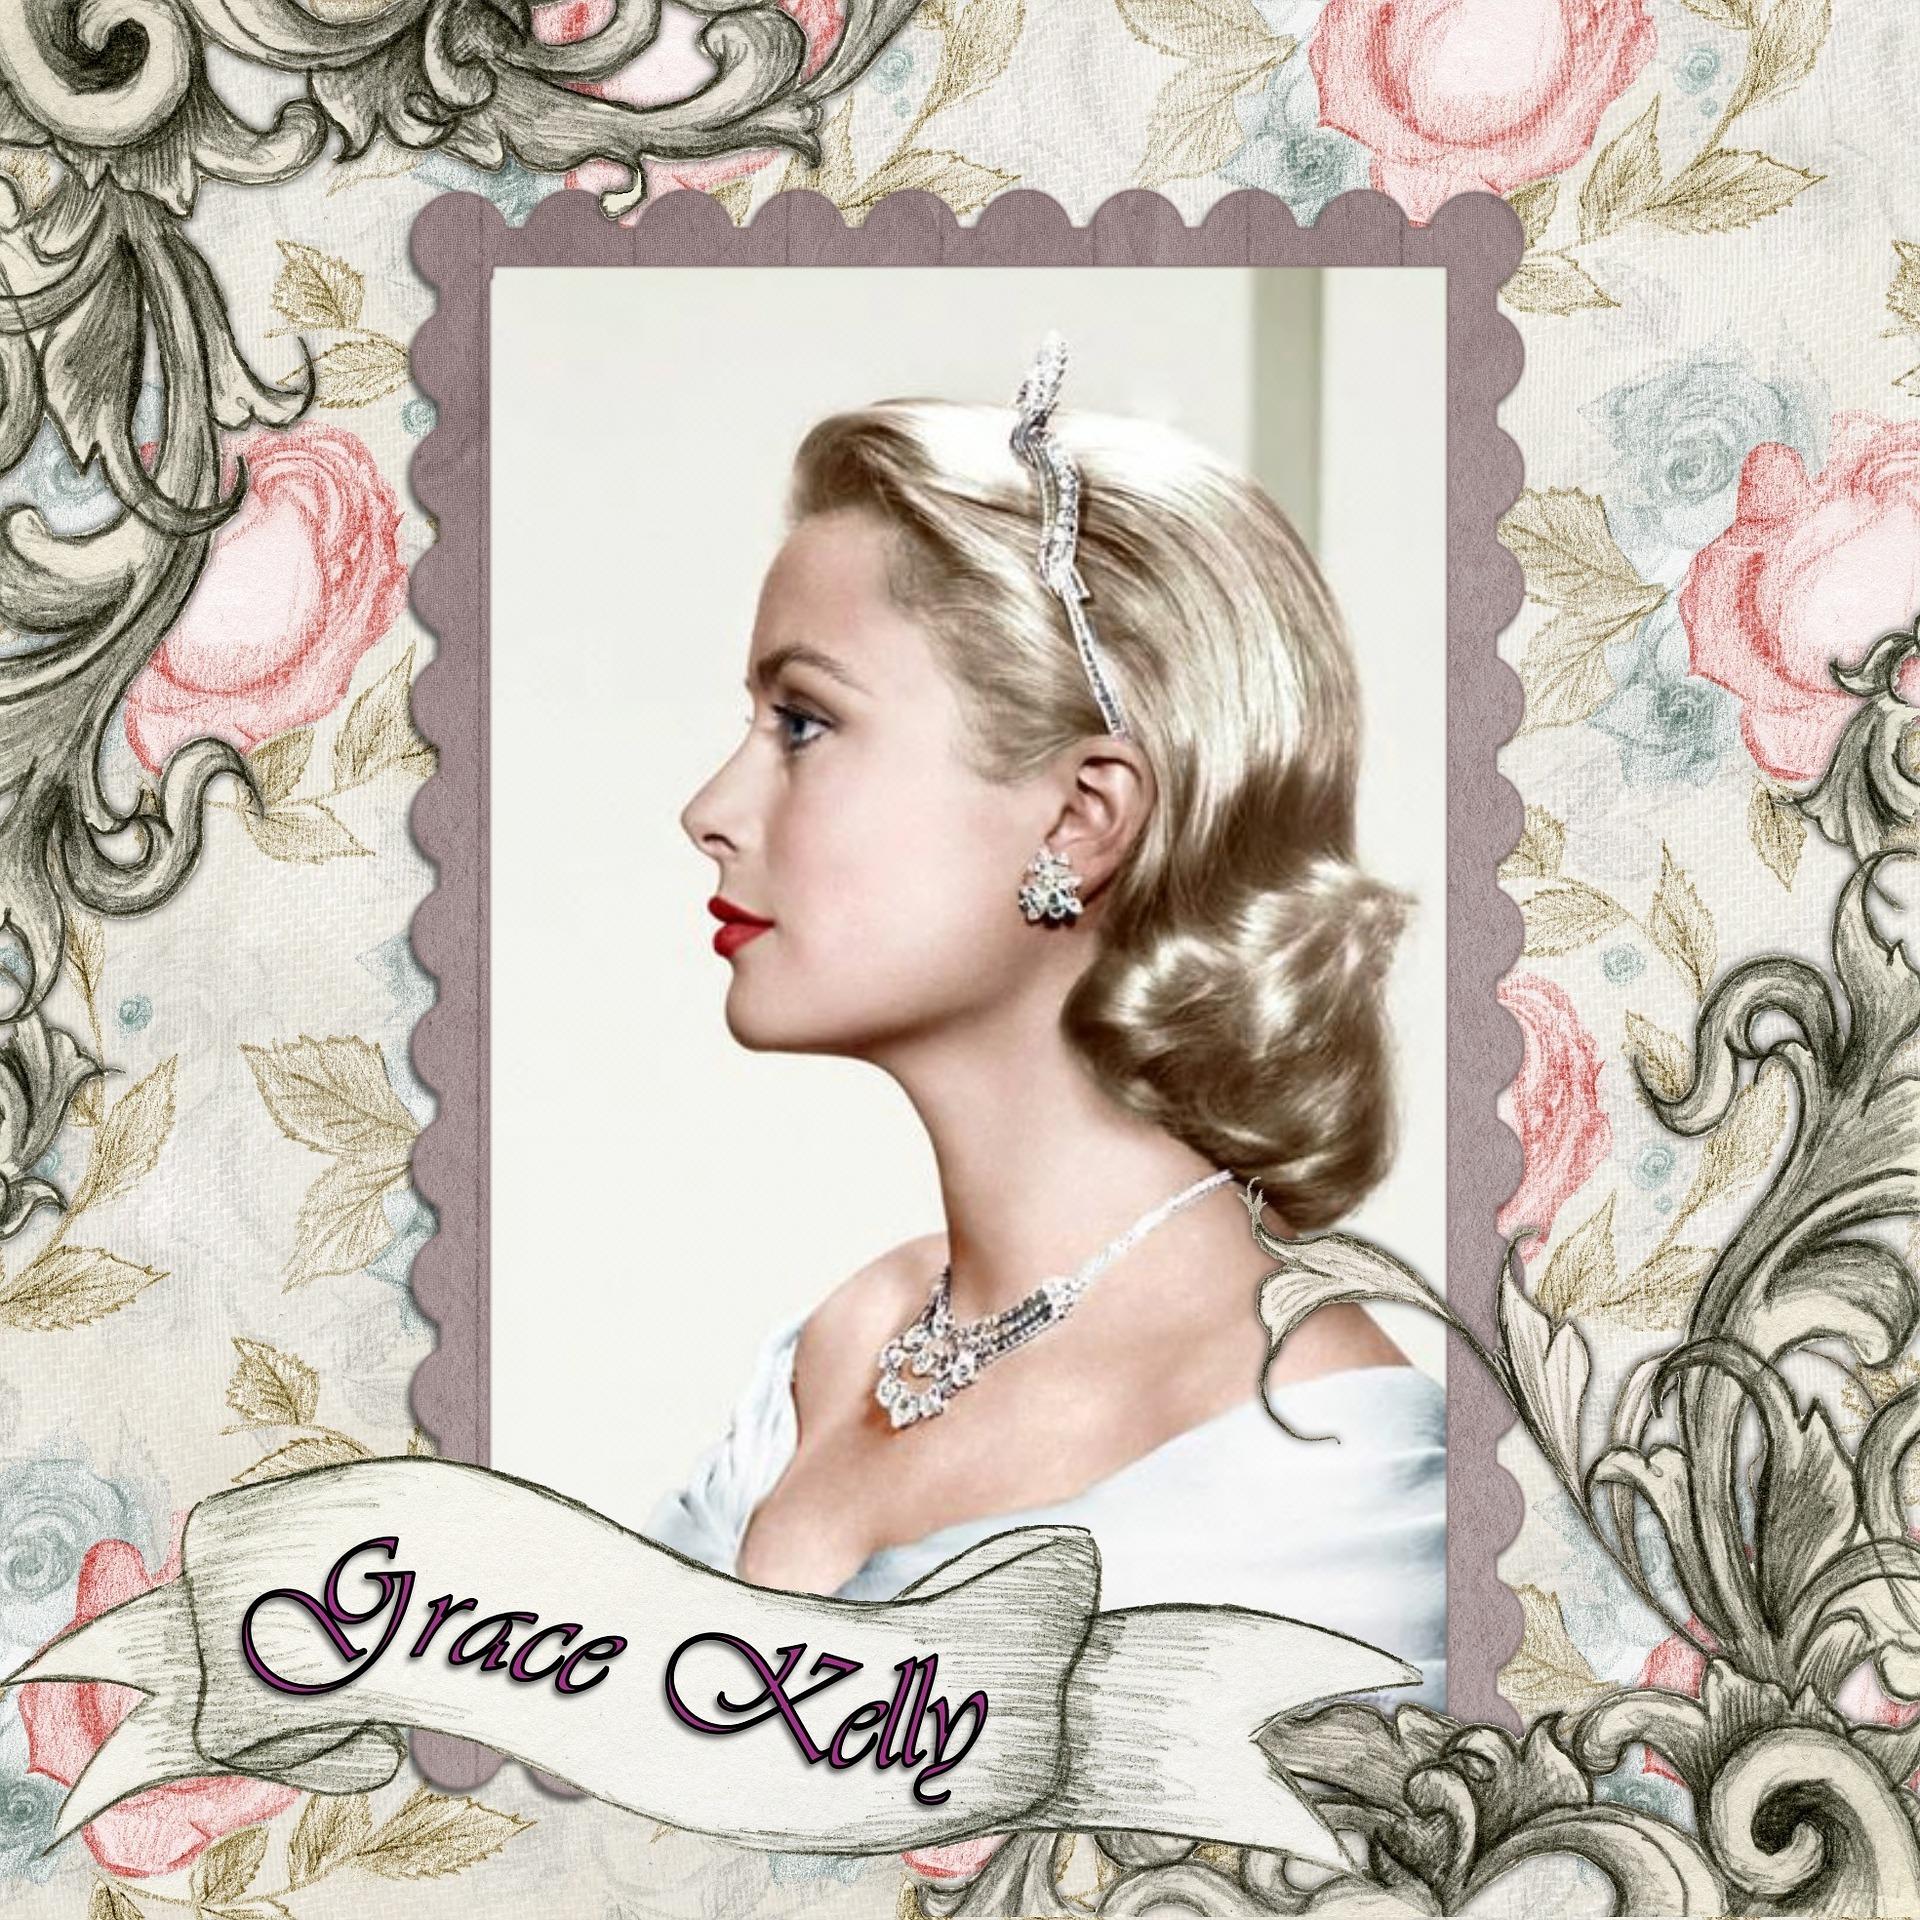 Grace Kelly hercegnő